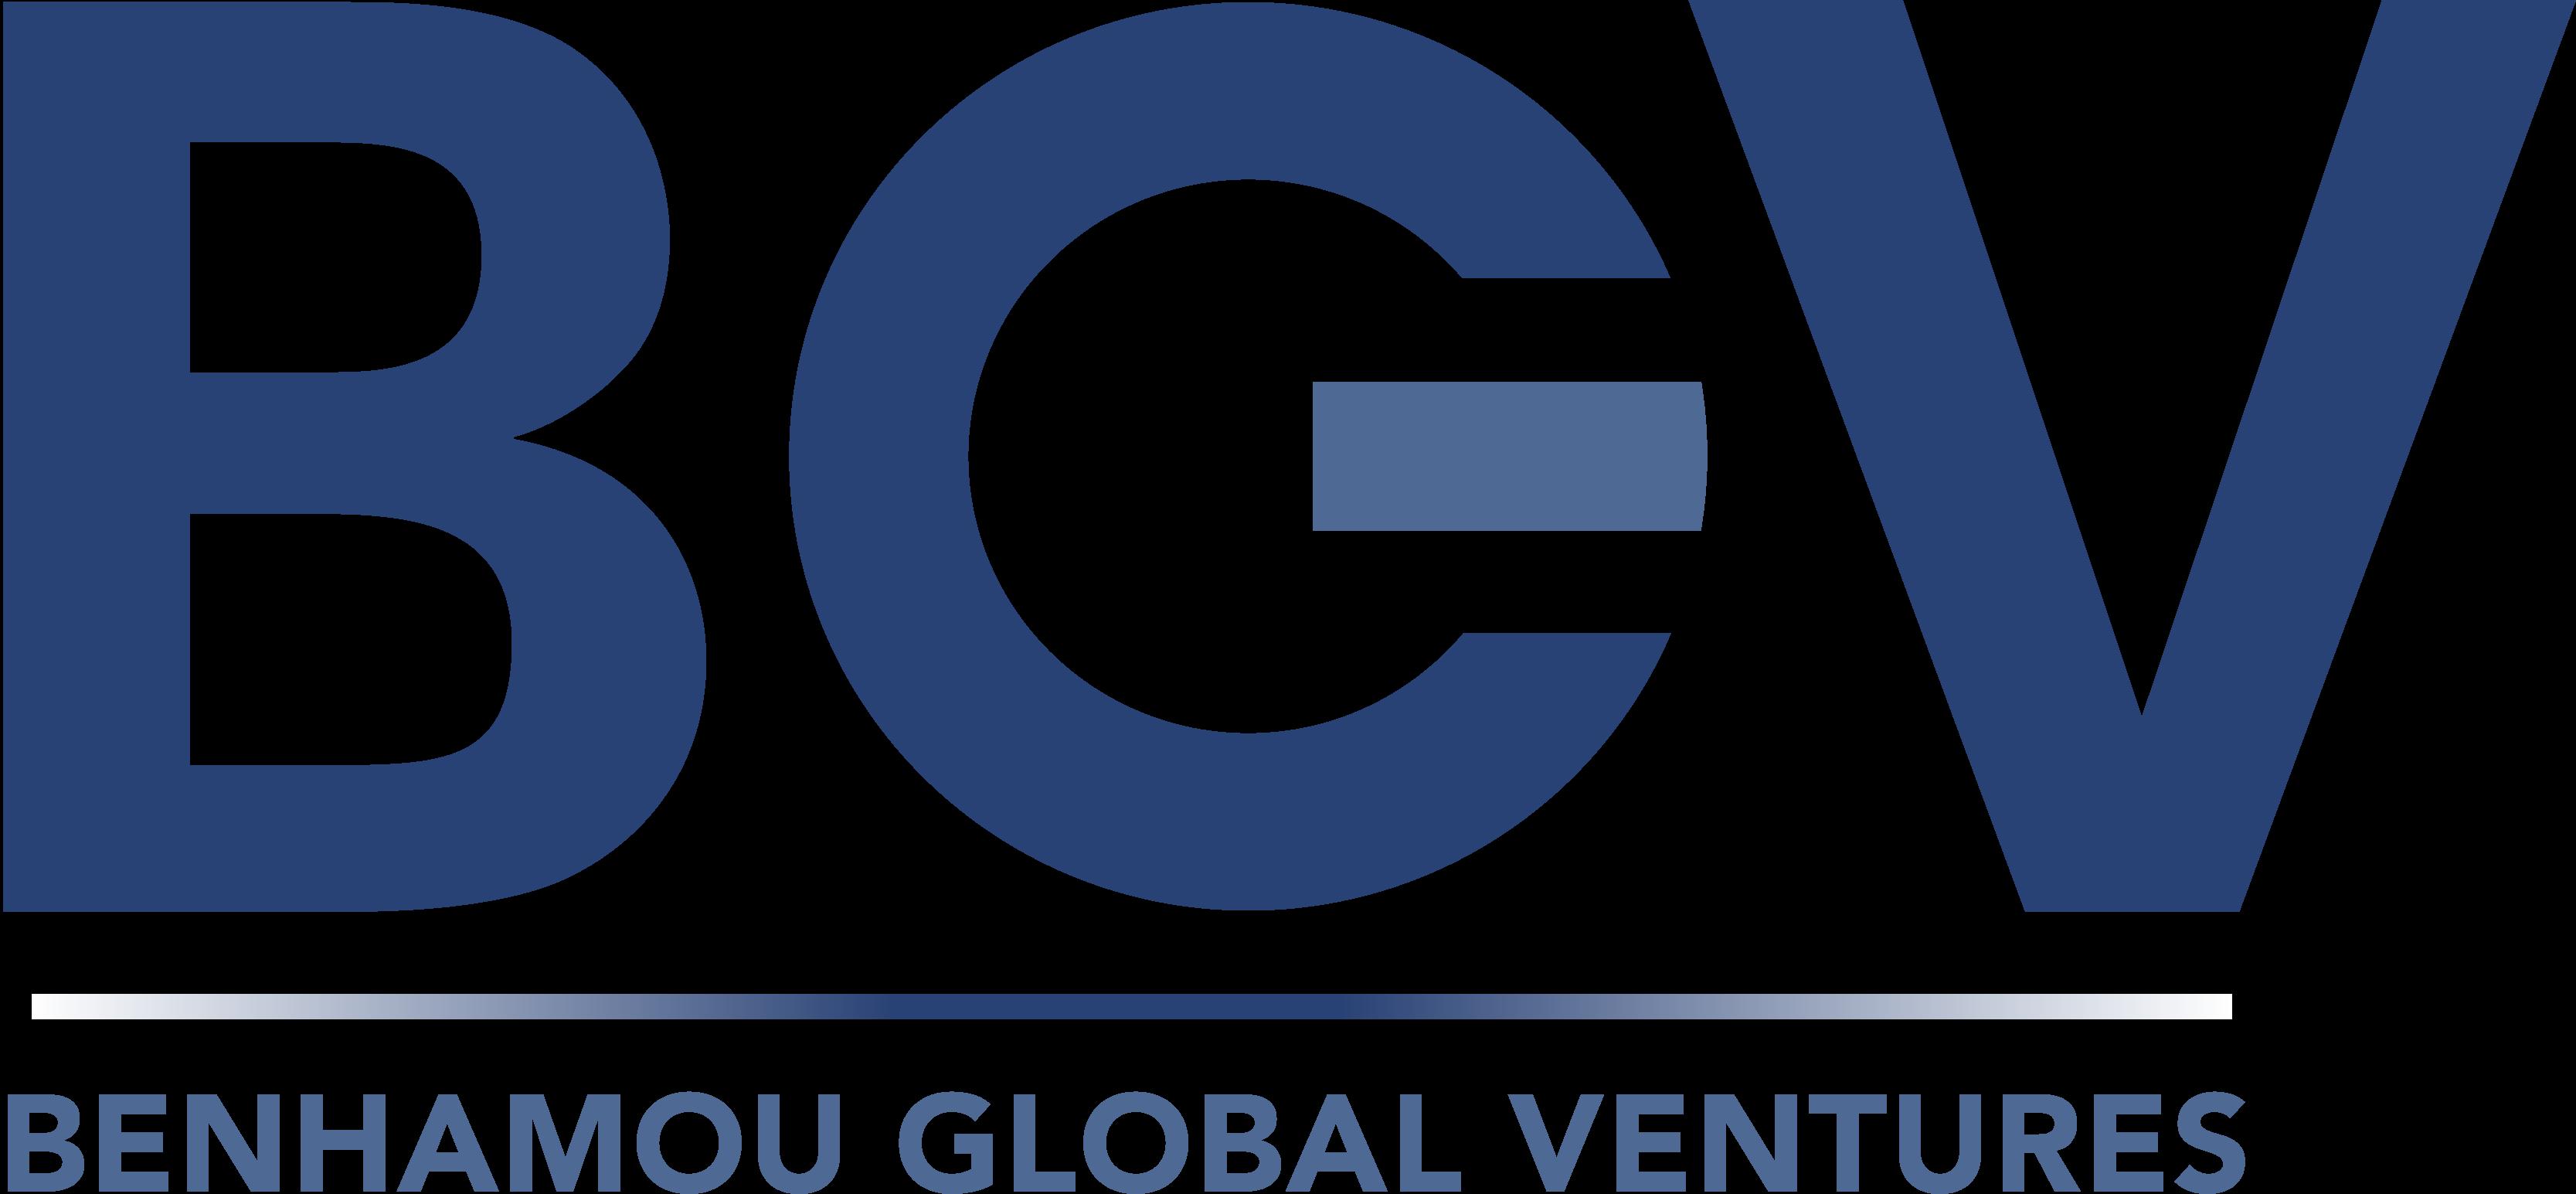 Benhamou Global Ventures